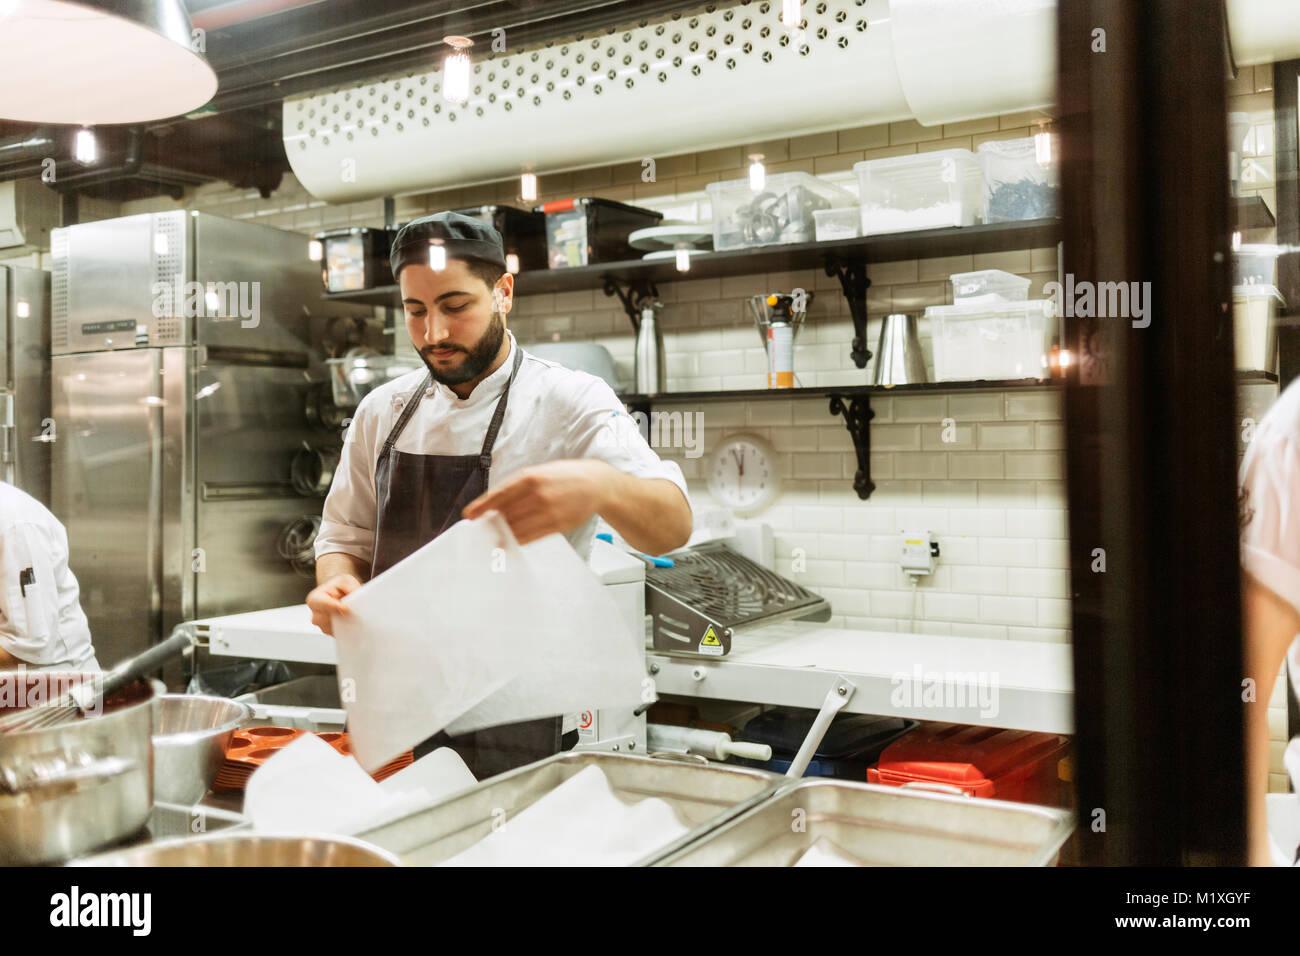 Chef en cocina Imagen De Stock